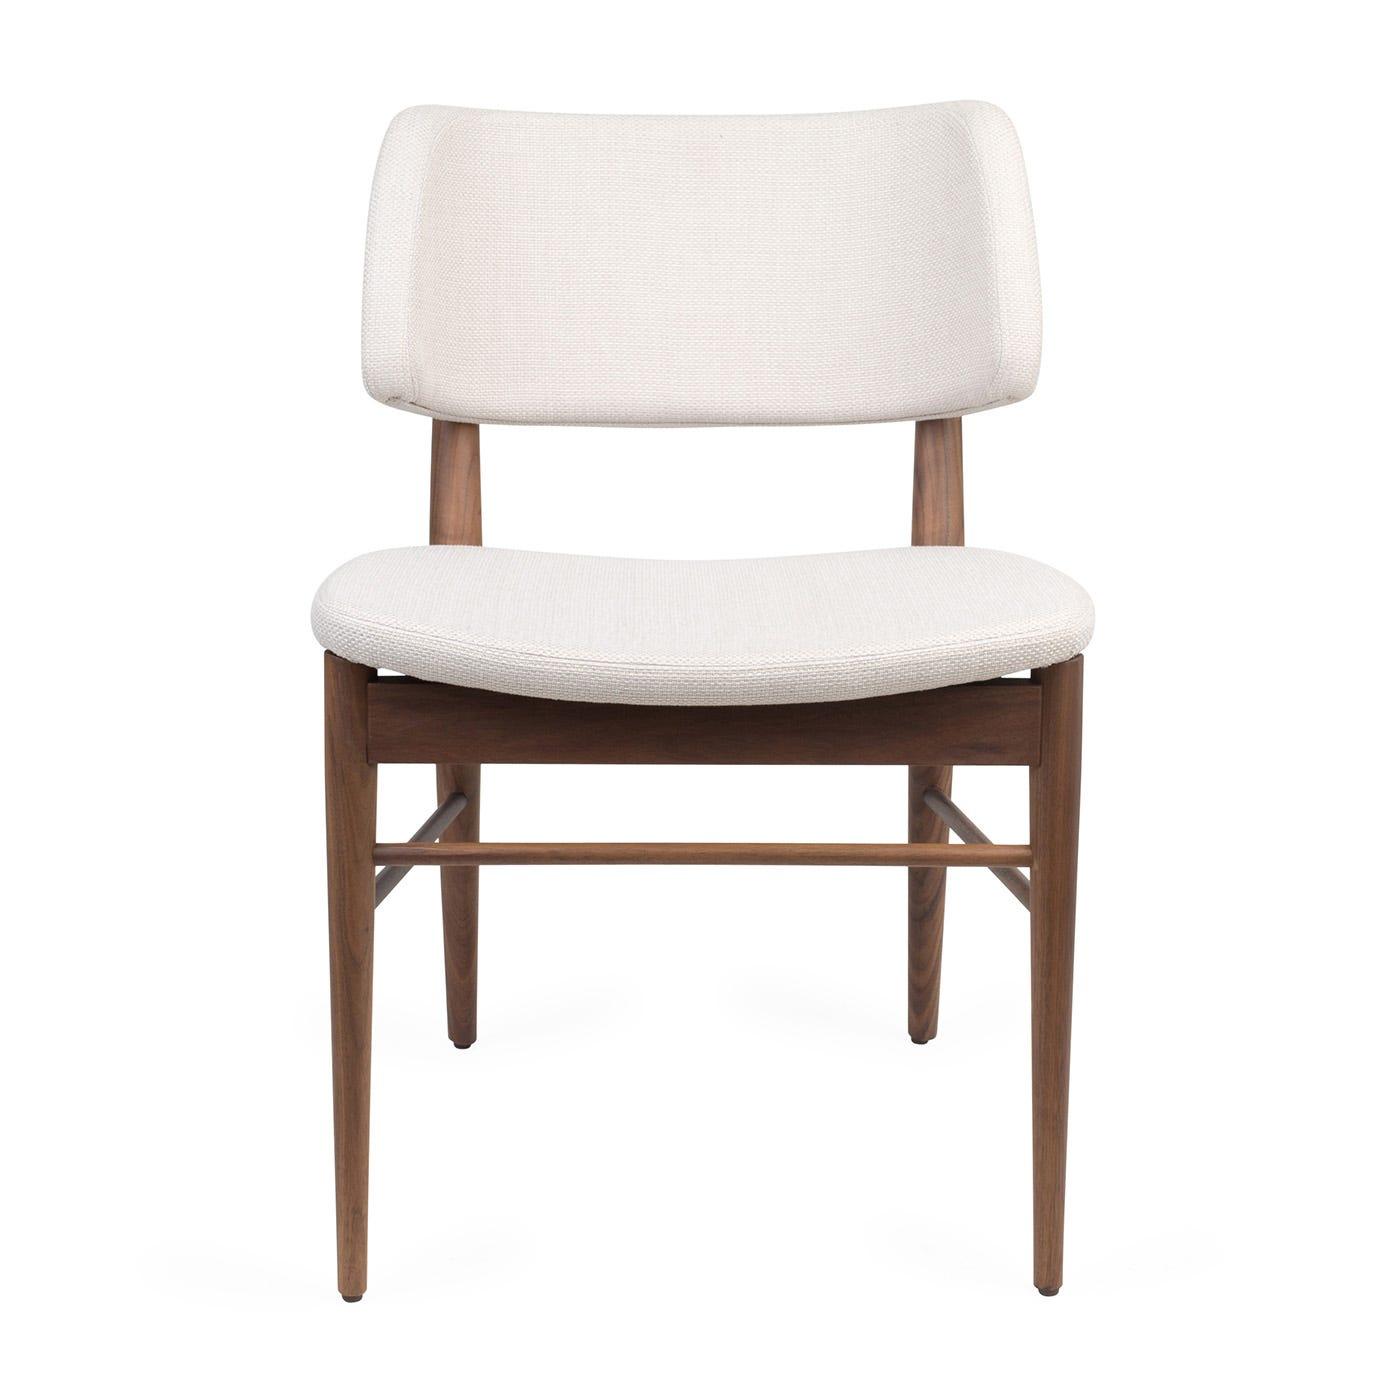 Porada Nissa Chair Walnut Var. 1762/09